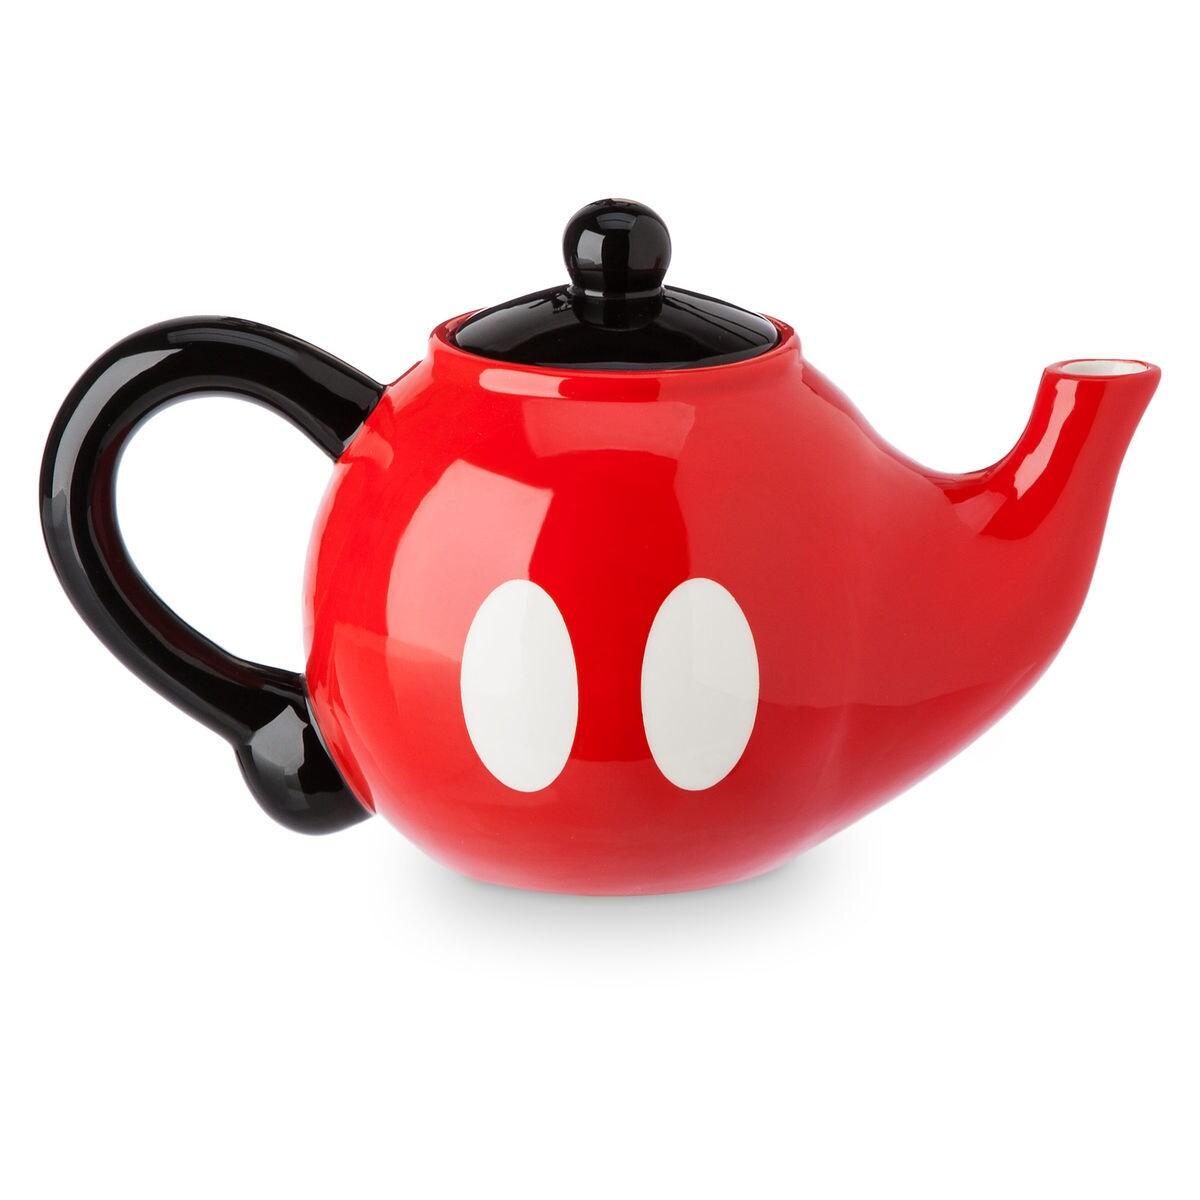 Mickey Mouse Colorful Kitchen Teapot | shopDisney